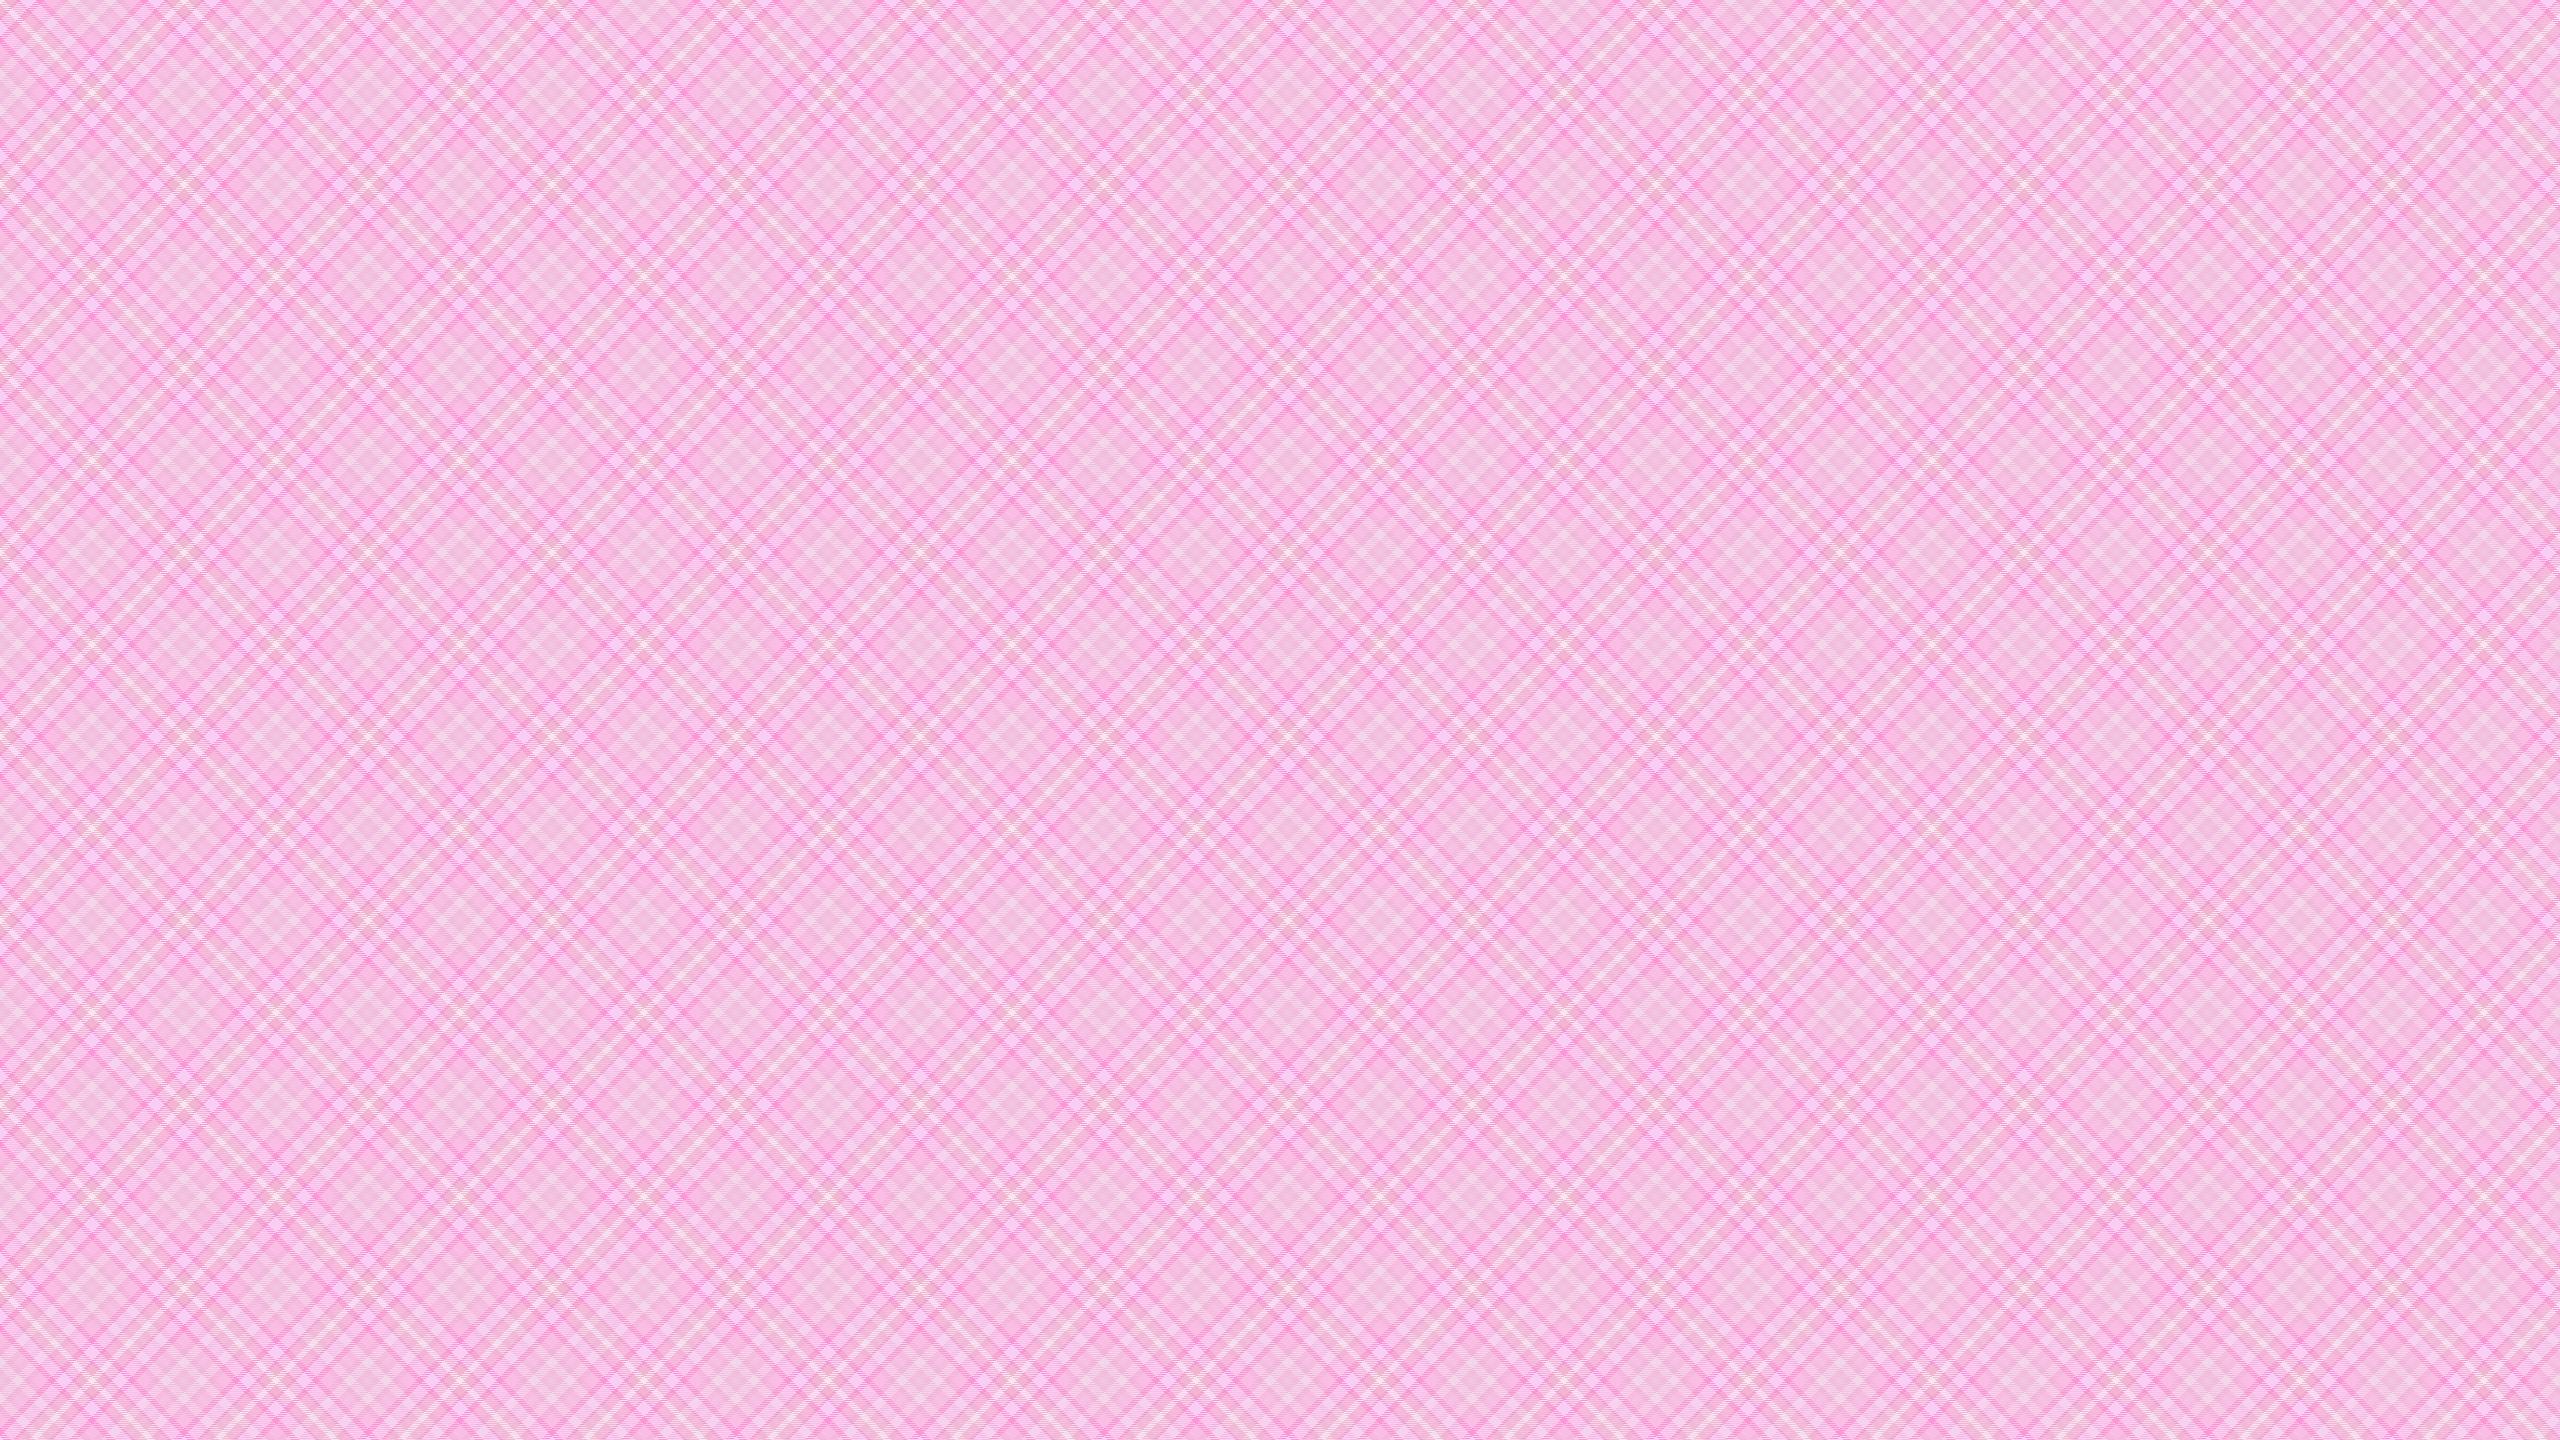 Pink Ribbon Iphone Wallpaper Breast Cancer Wallpapers Free Download Pixelstalk Net